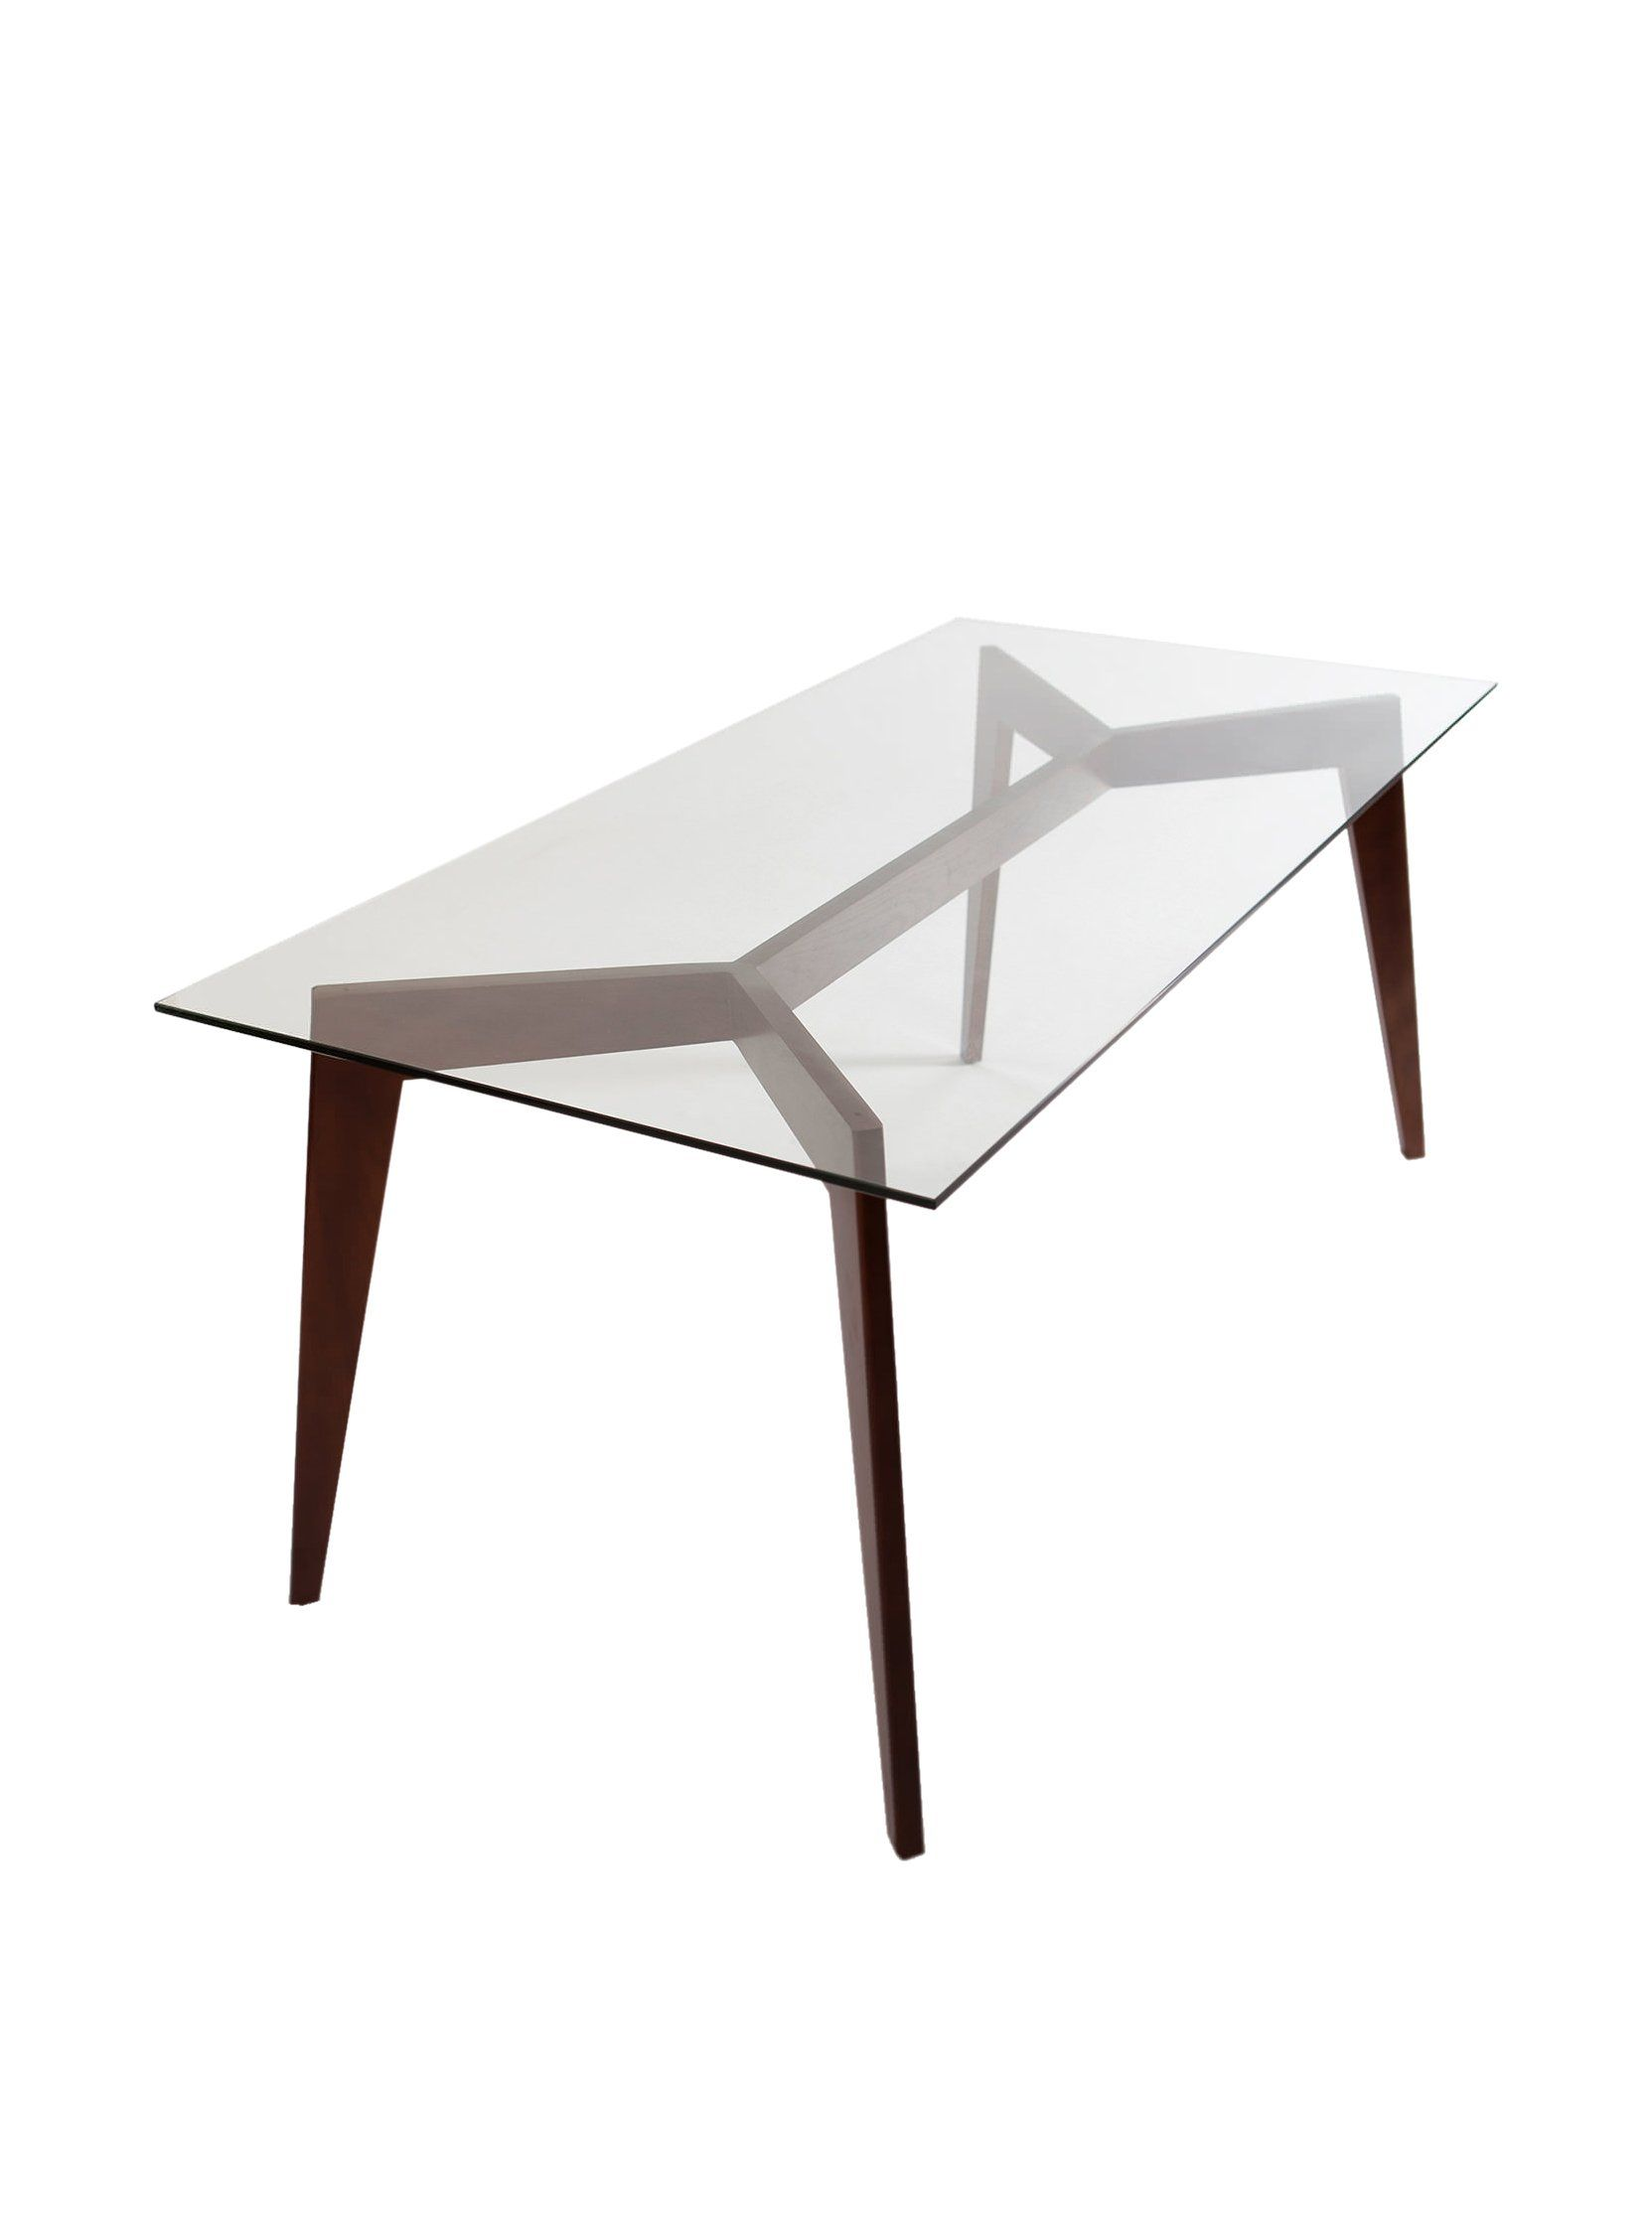 Myhabit Midcentury Modern Dining Table Modern Dining Table Dining Table [ 2228 x 1663 Pixel ]